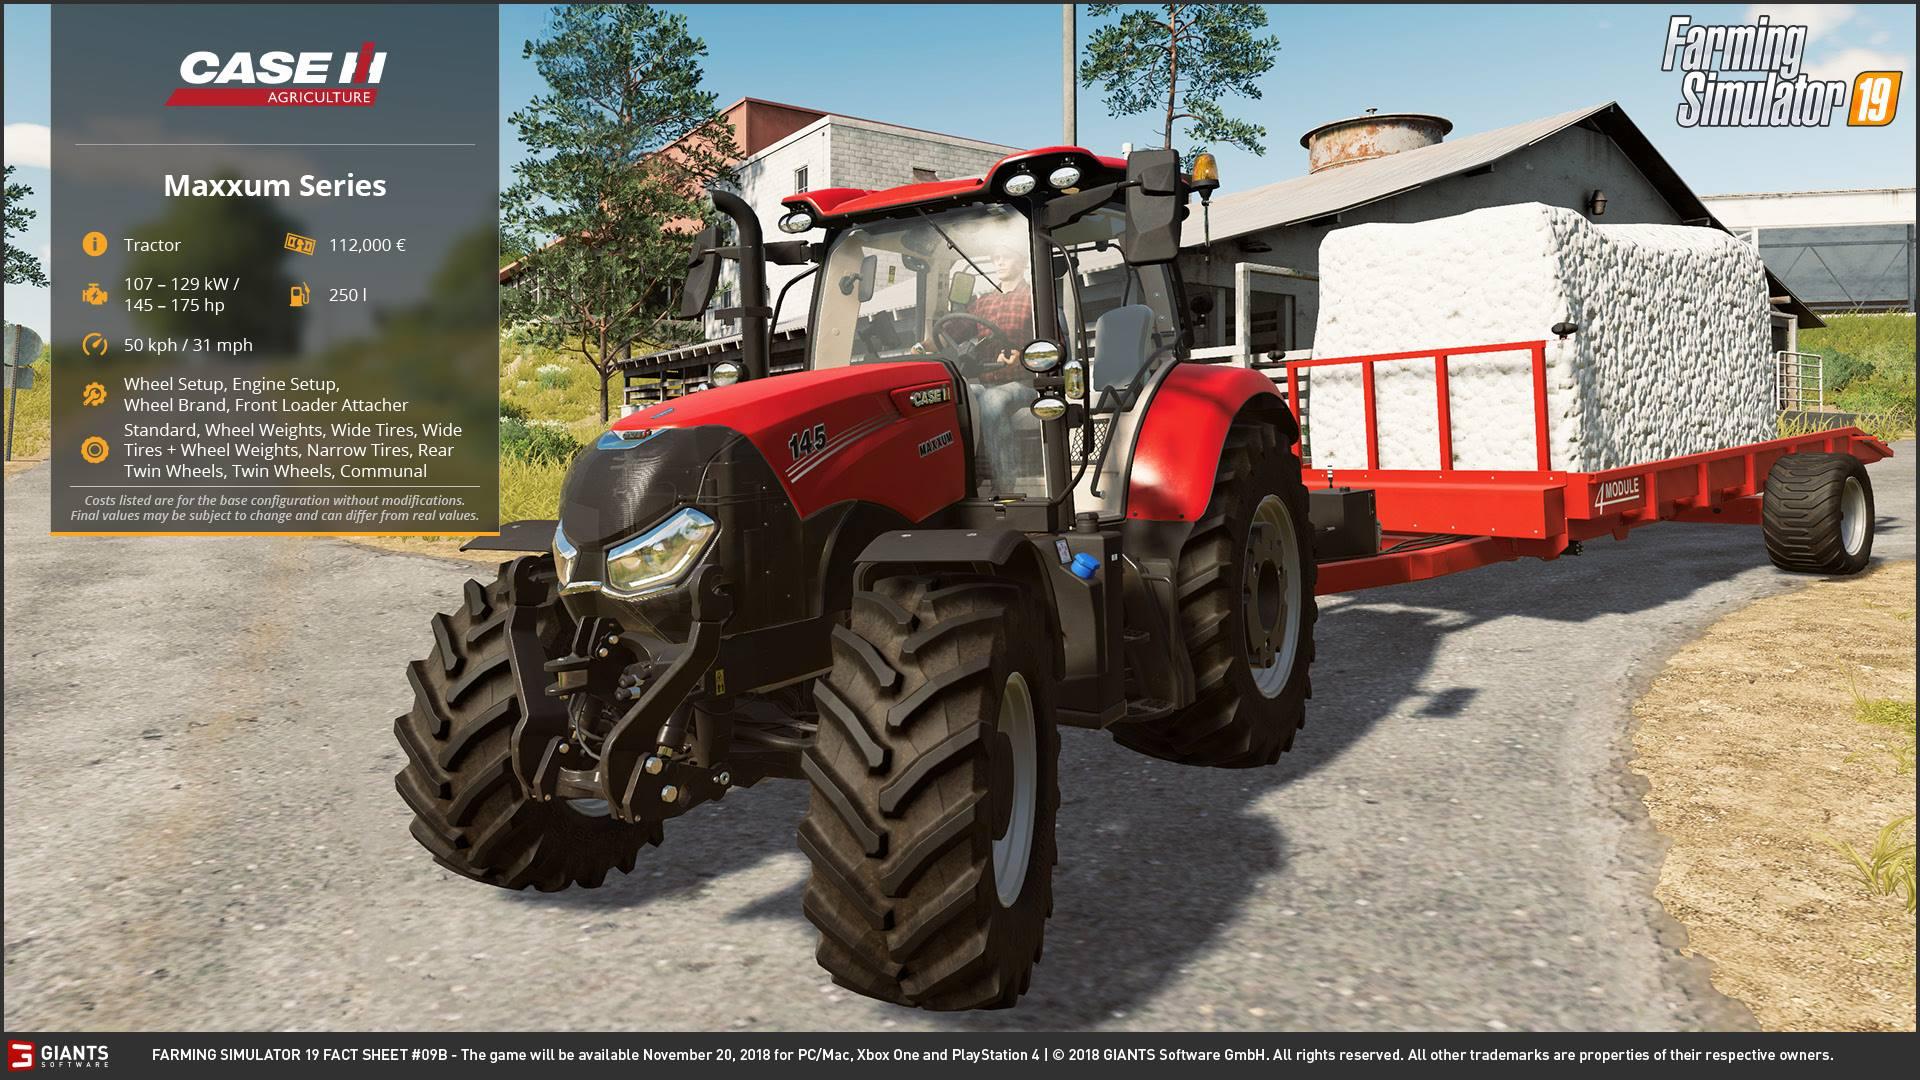 Case Vehicles in Farming Simulator 2019 - Farming Simulator